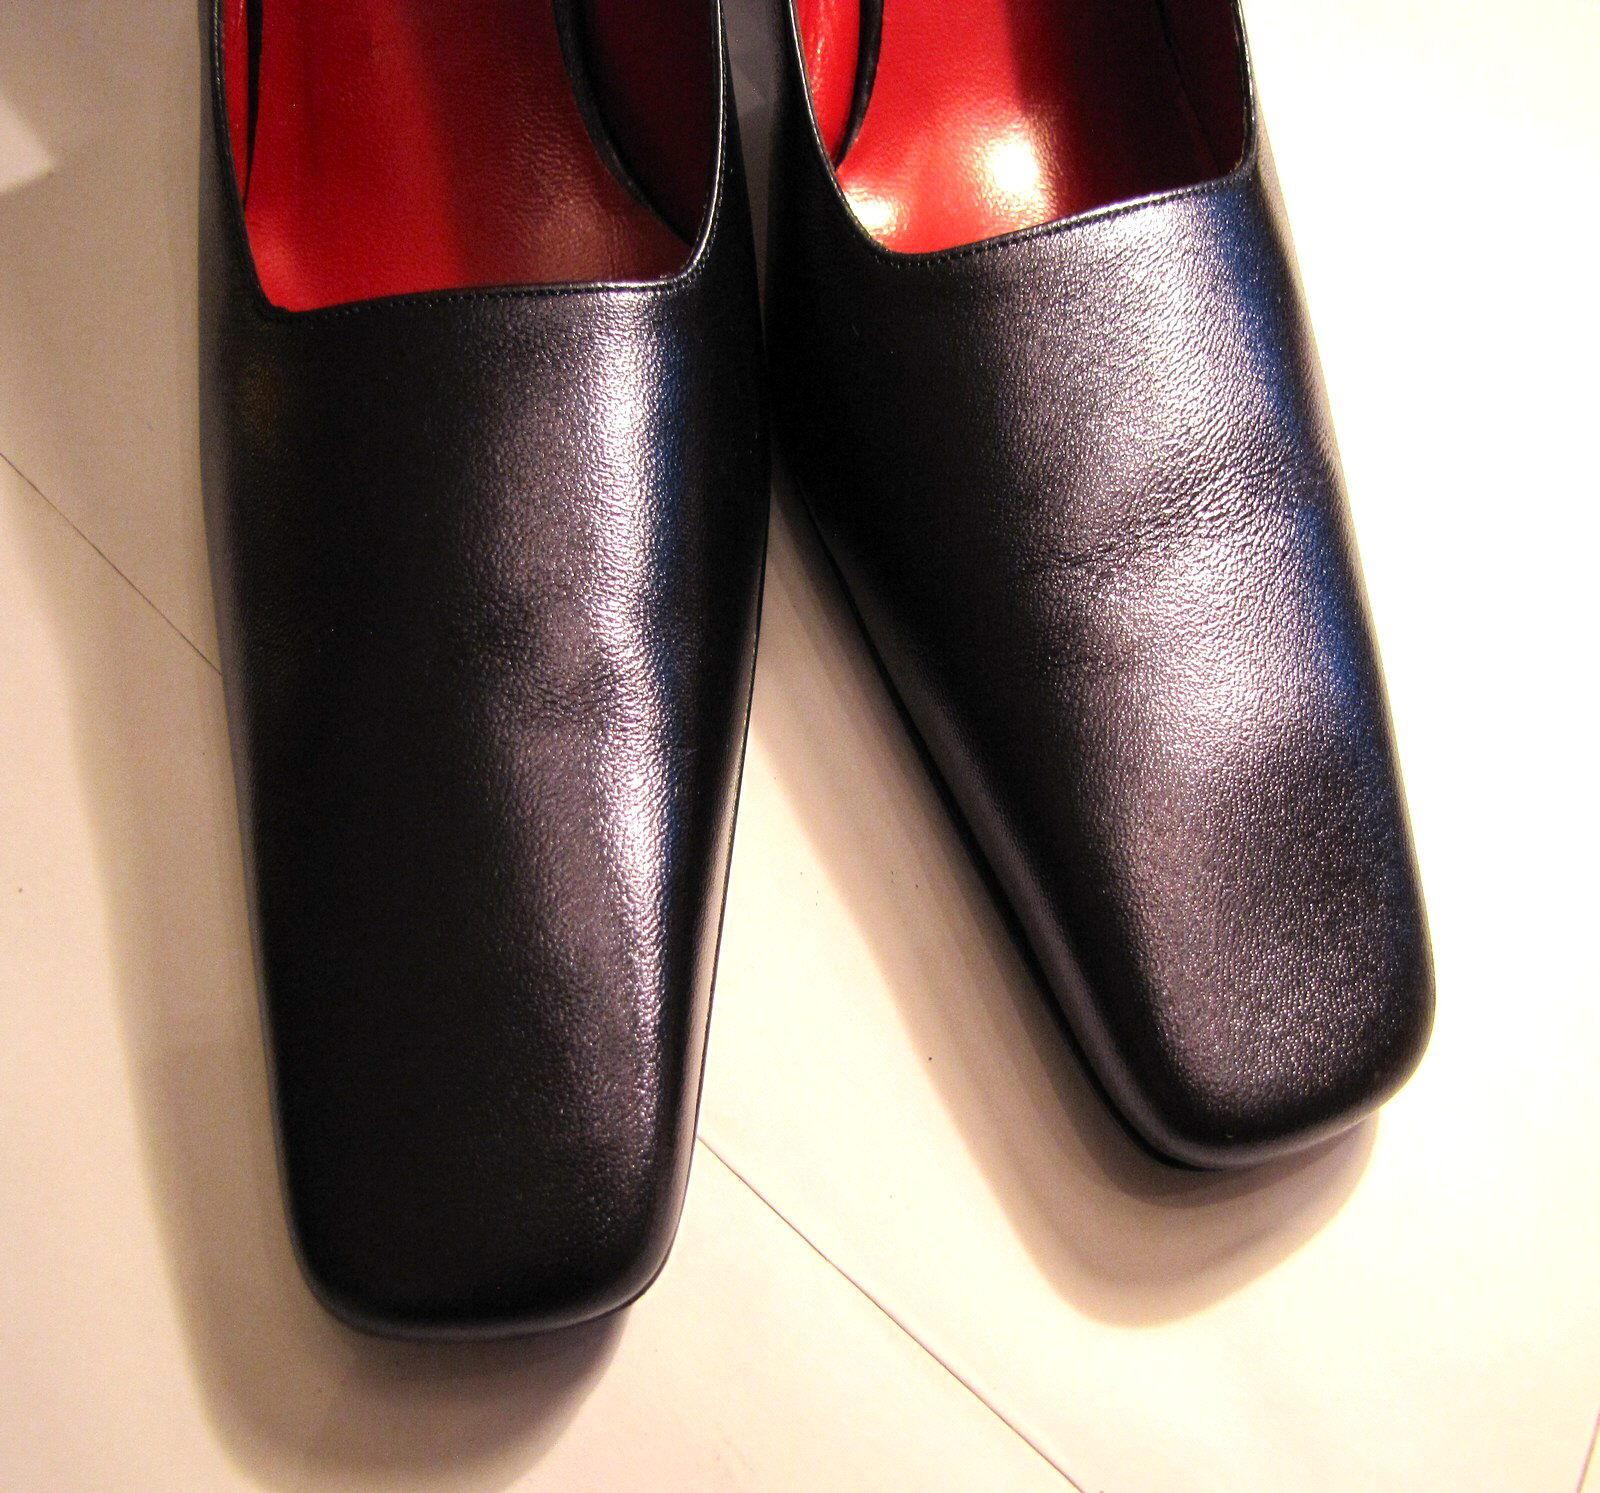 RODO women's sandals large heels 8 8 8 cm shoes rare collection bluee skin 37 1 2 eu 7864e3